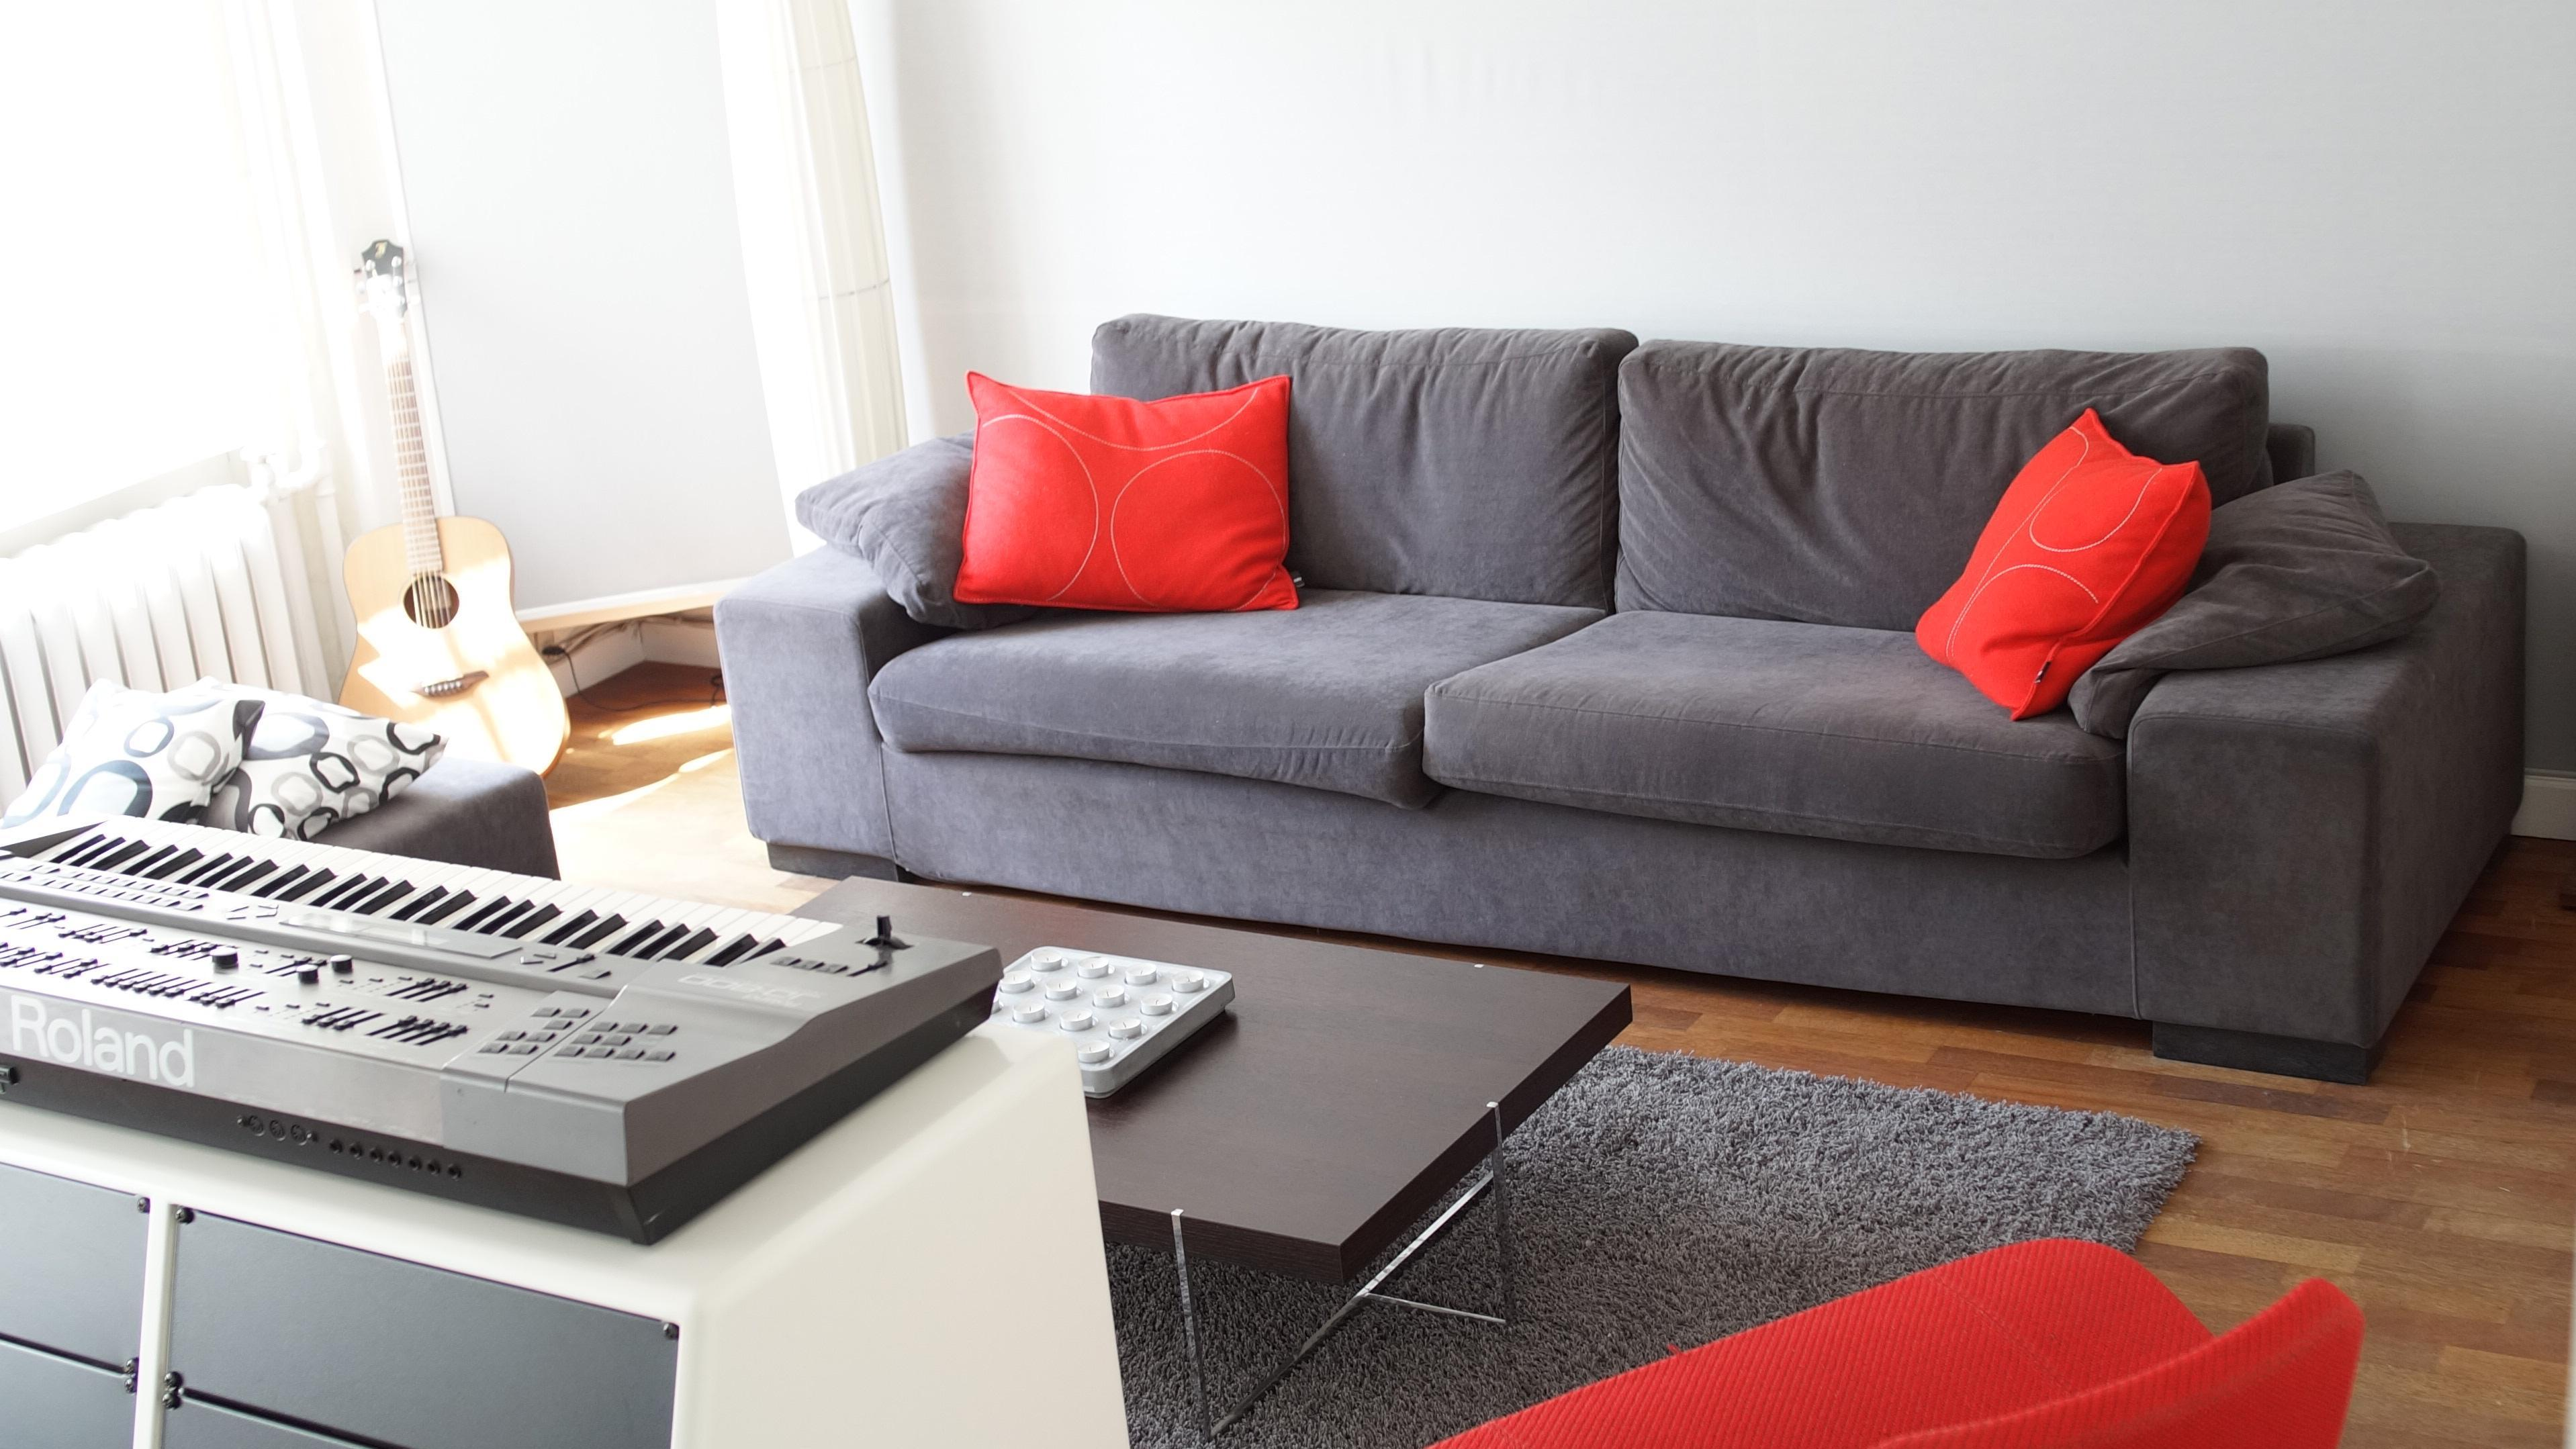 sofa cleaning atlanta lawson oak furniture land eco friendly protection for your home zerorez